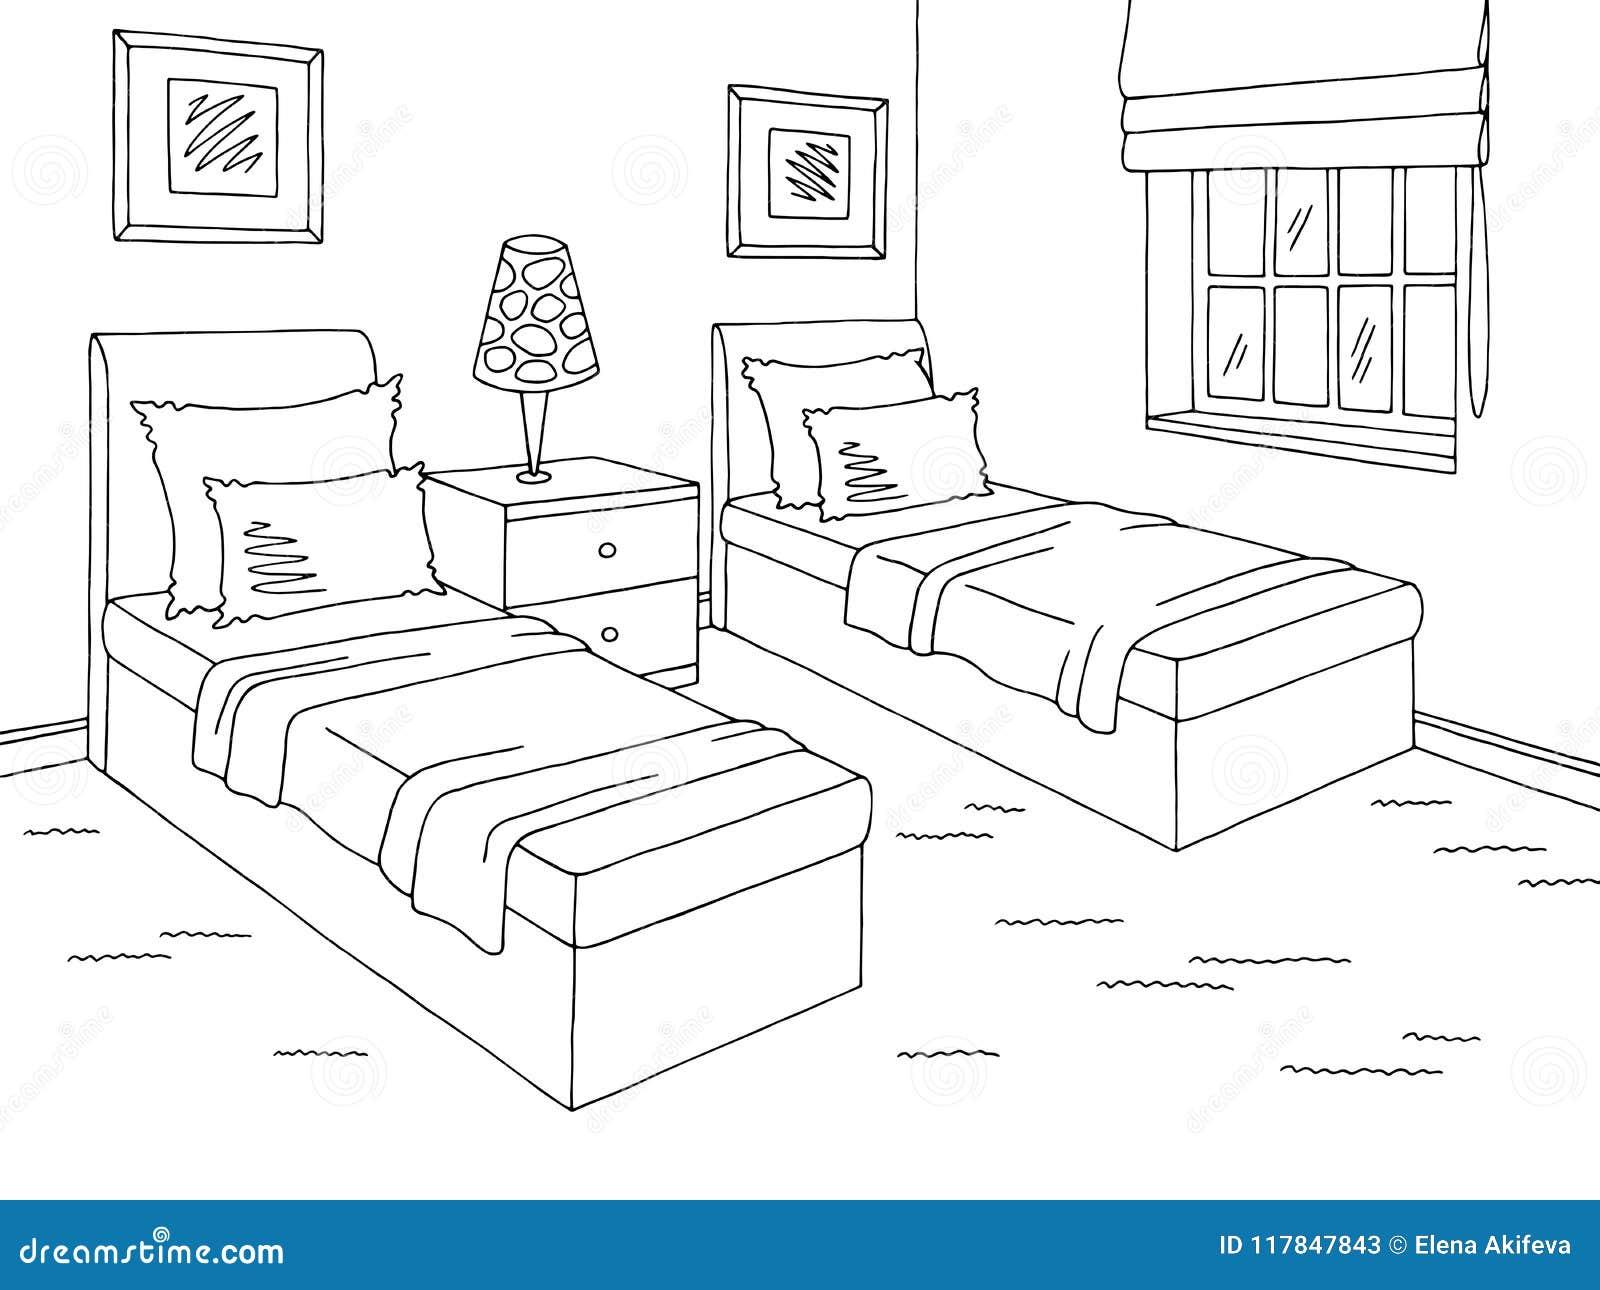 Children Room Graphic Black White Home Interior Sketch Illustration